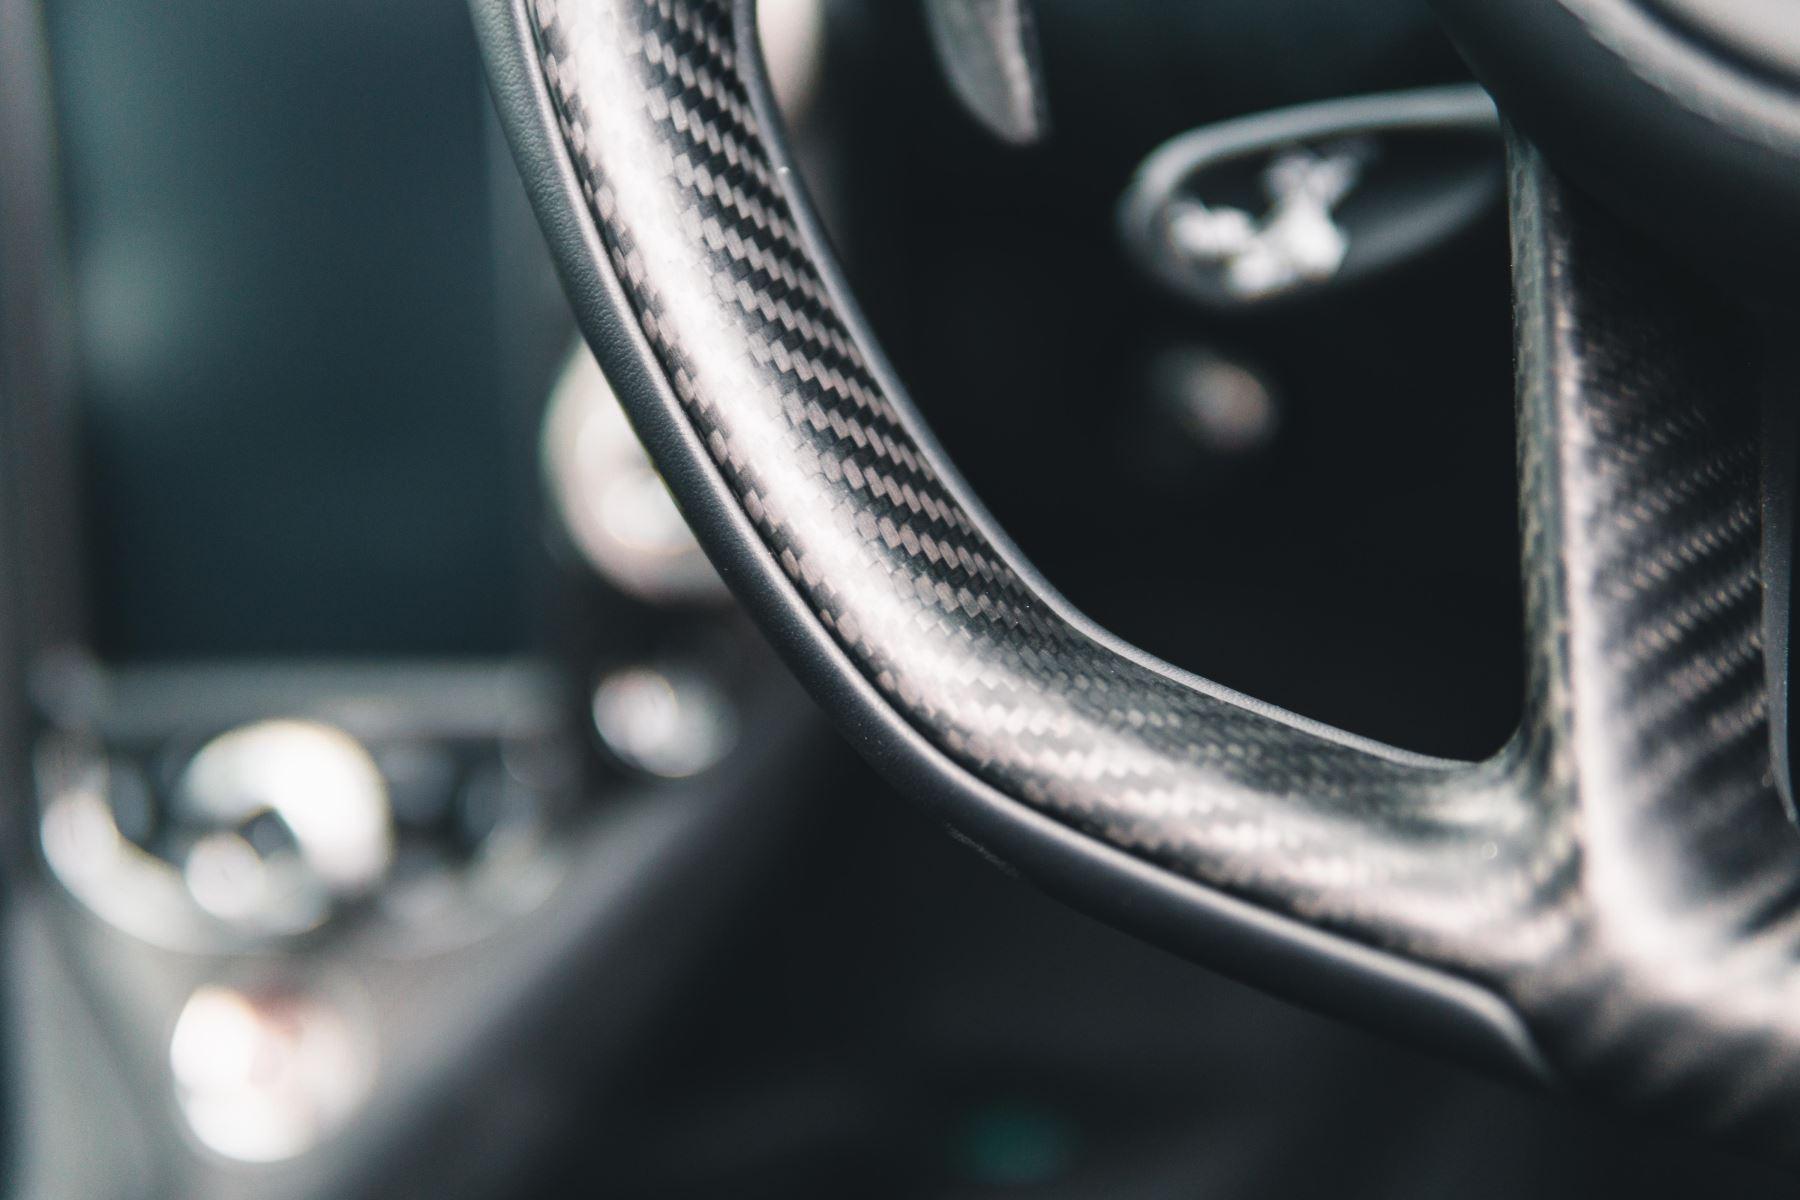 McLaren 720S Performance V8 Coupe SSG image 35